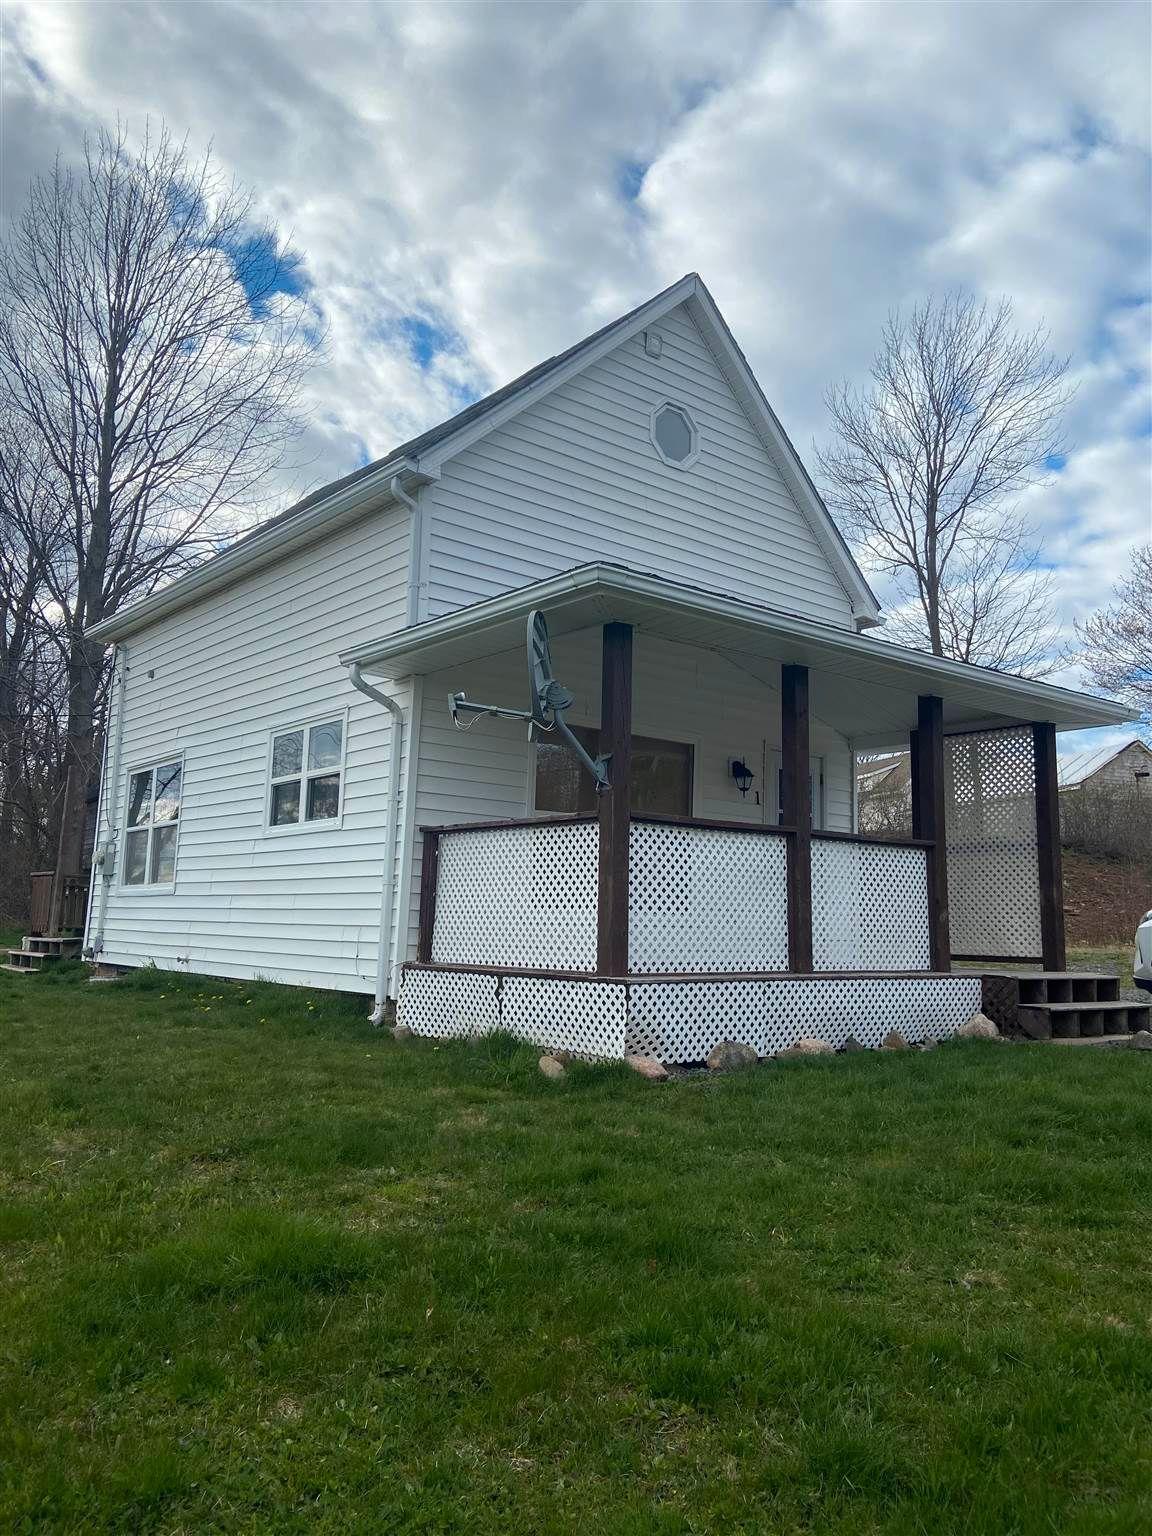 Main Photo: 1 Fourth Street in Trenton: 107-Trenton,Westville,Pictou Residential for sale (Northern Region)  : MLS®# 202110429